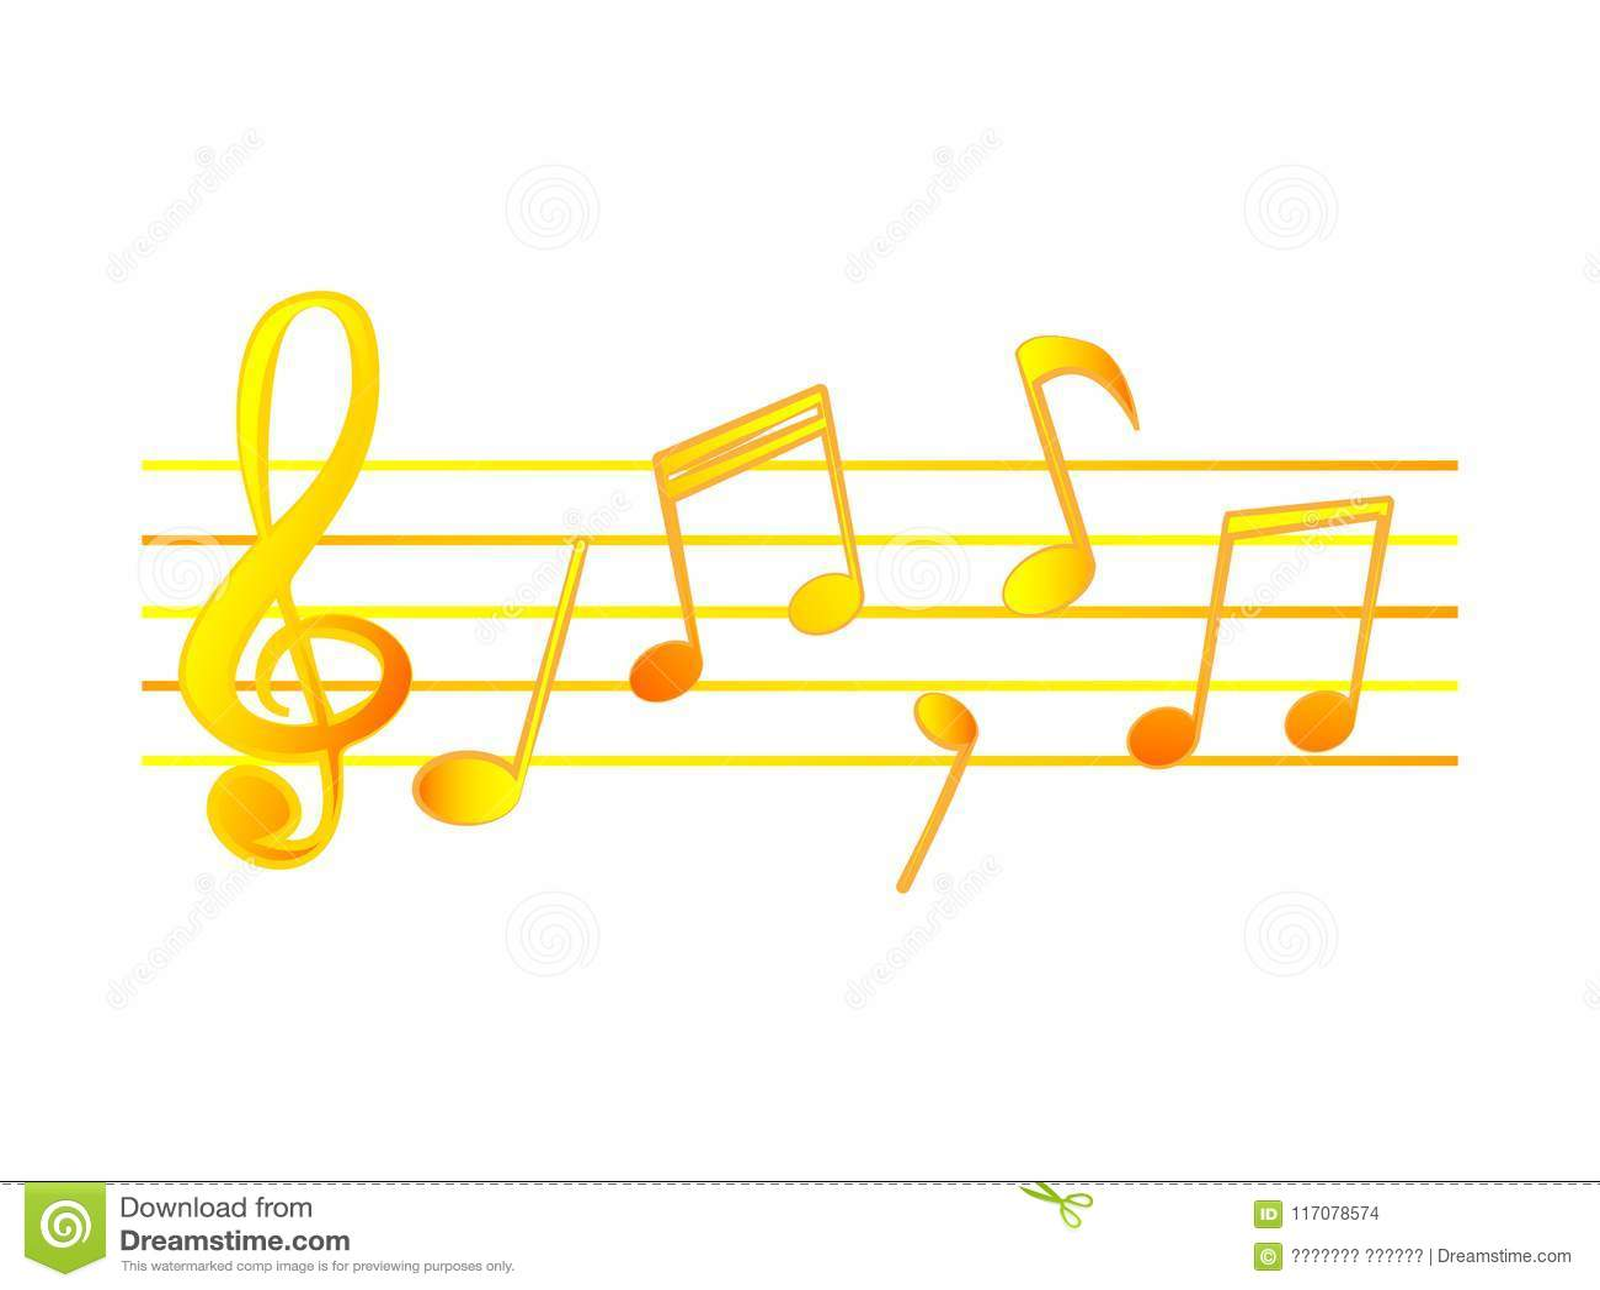 Diseño Maravilloso De Notas Musicales De Oro Sobre Un